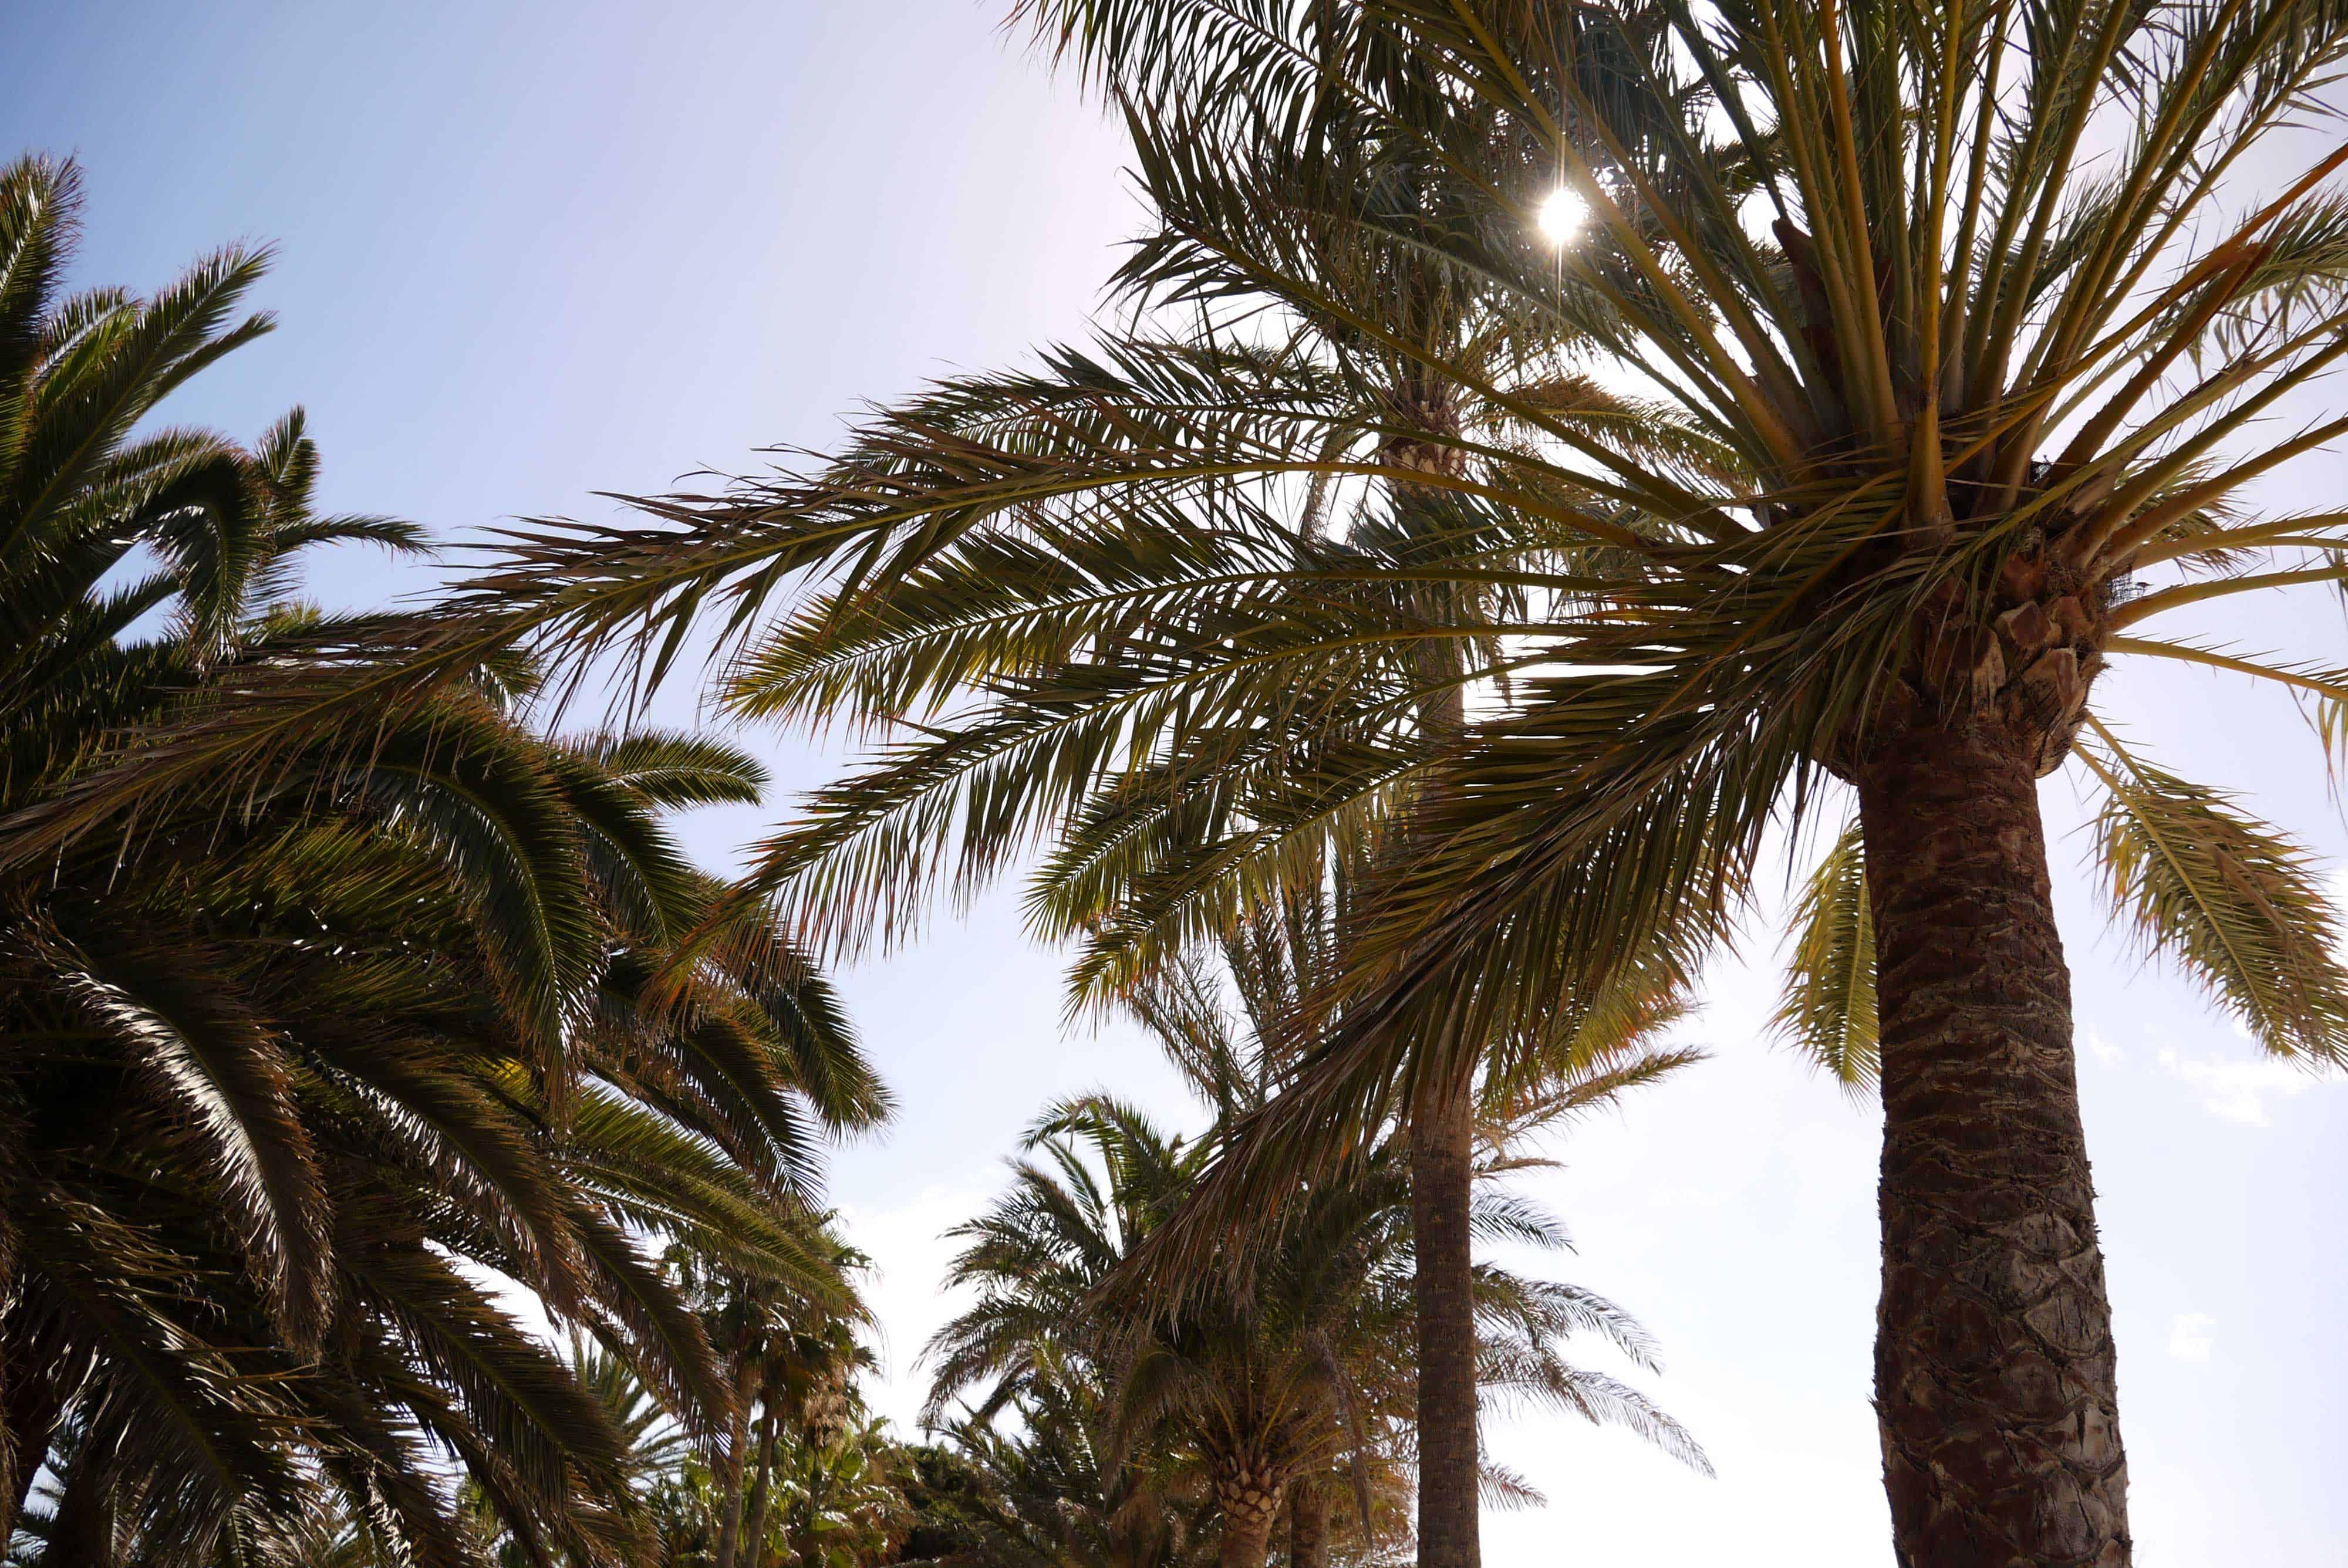 Palmen an der Strandpromenade in Morro Jable